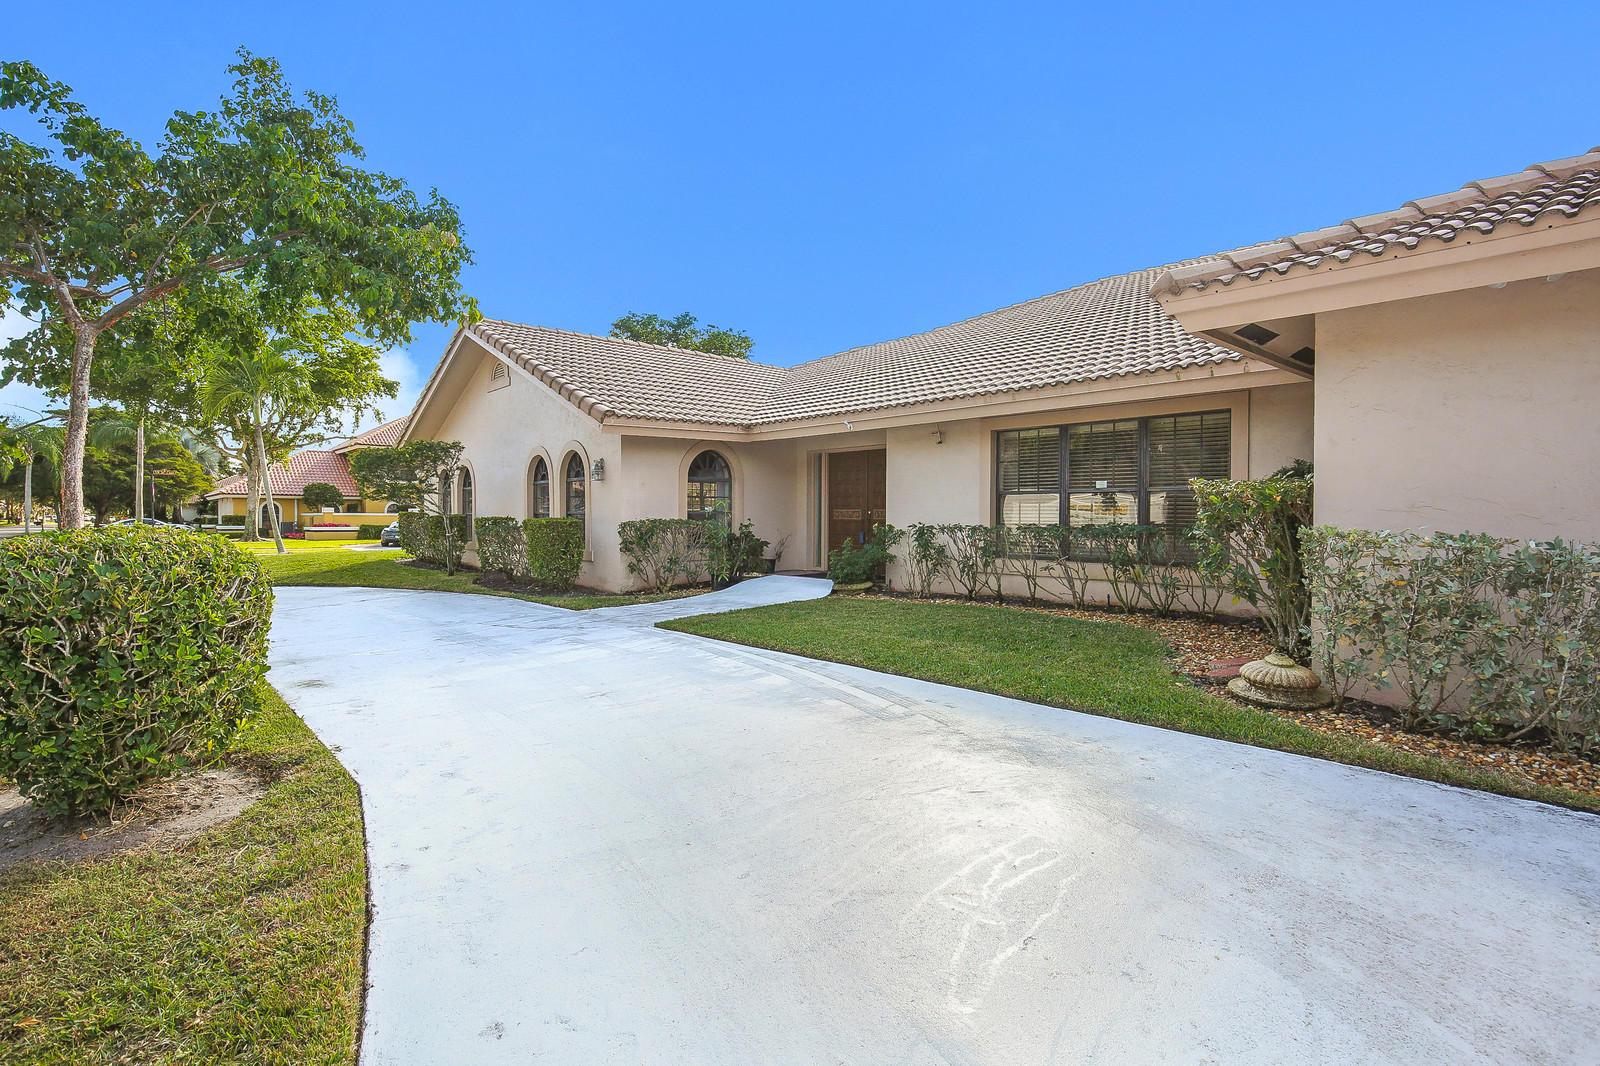 2674 29 Drive, Boca Raton, Florida 33434, 3 Bedrooms Bedrooms, ,4 BathroomsBathrooms,Single Family,For Sale,NEW FLORESTA,29,RX-10483794